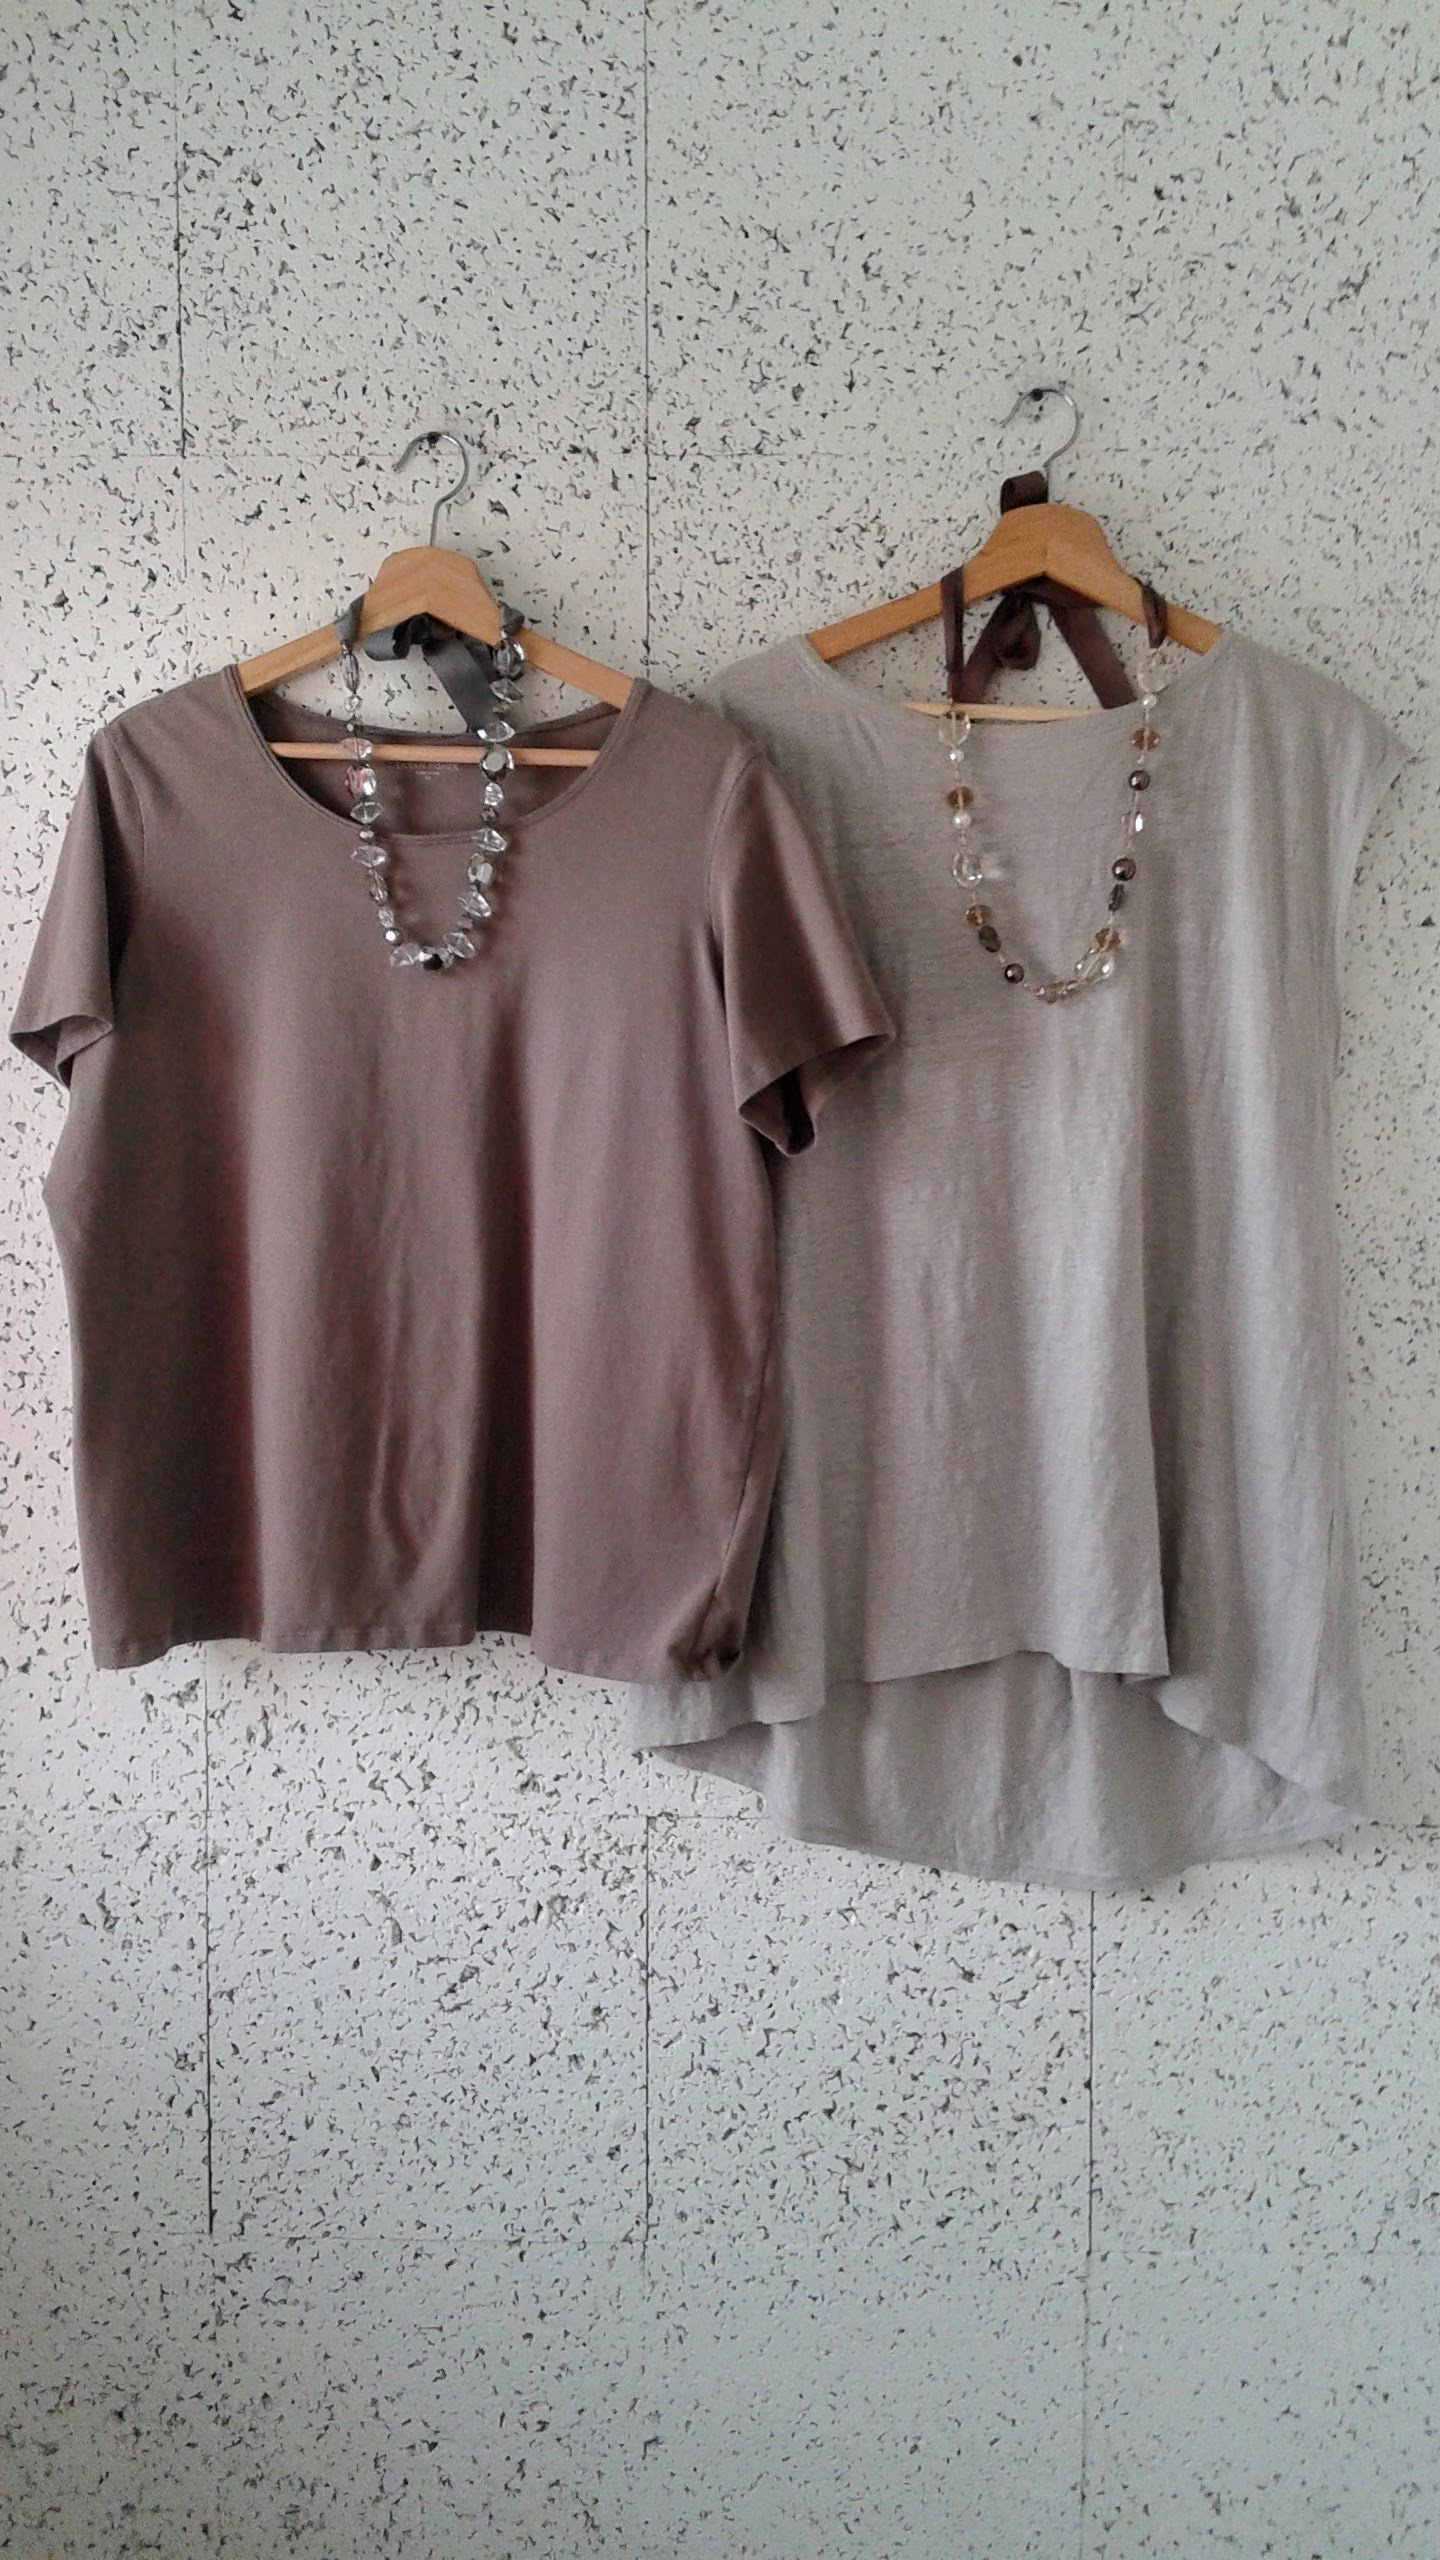 Eileen Fisher beige top; Size XL, $30. Eileen Fisher grey top; Size L, $40